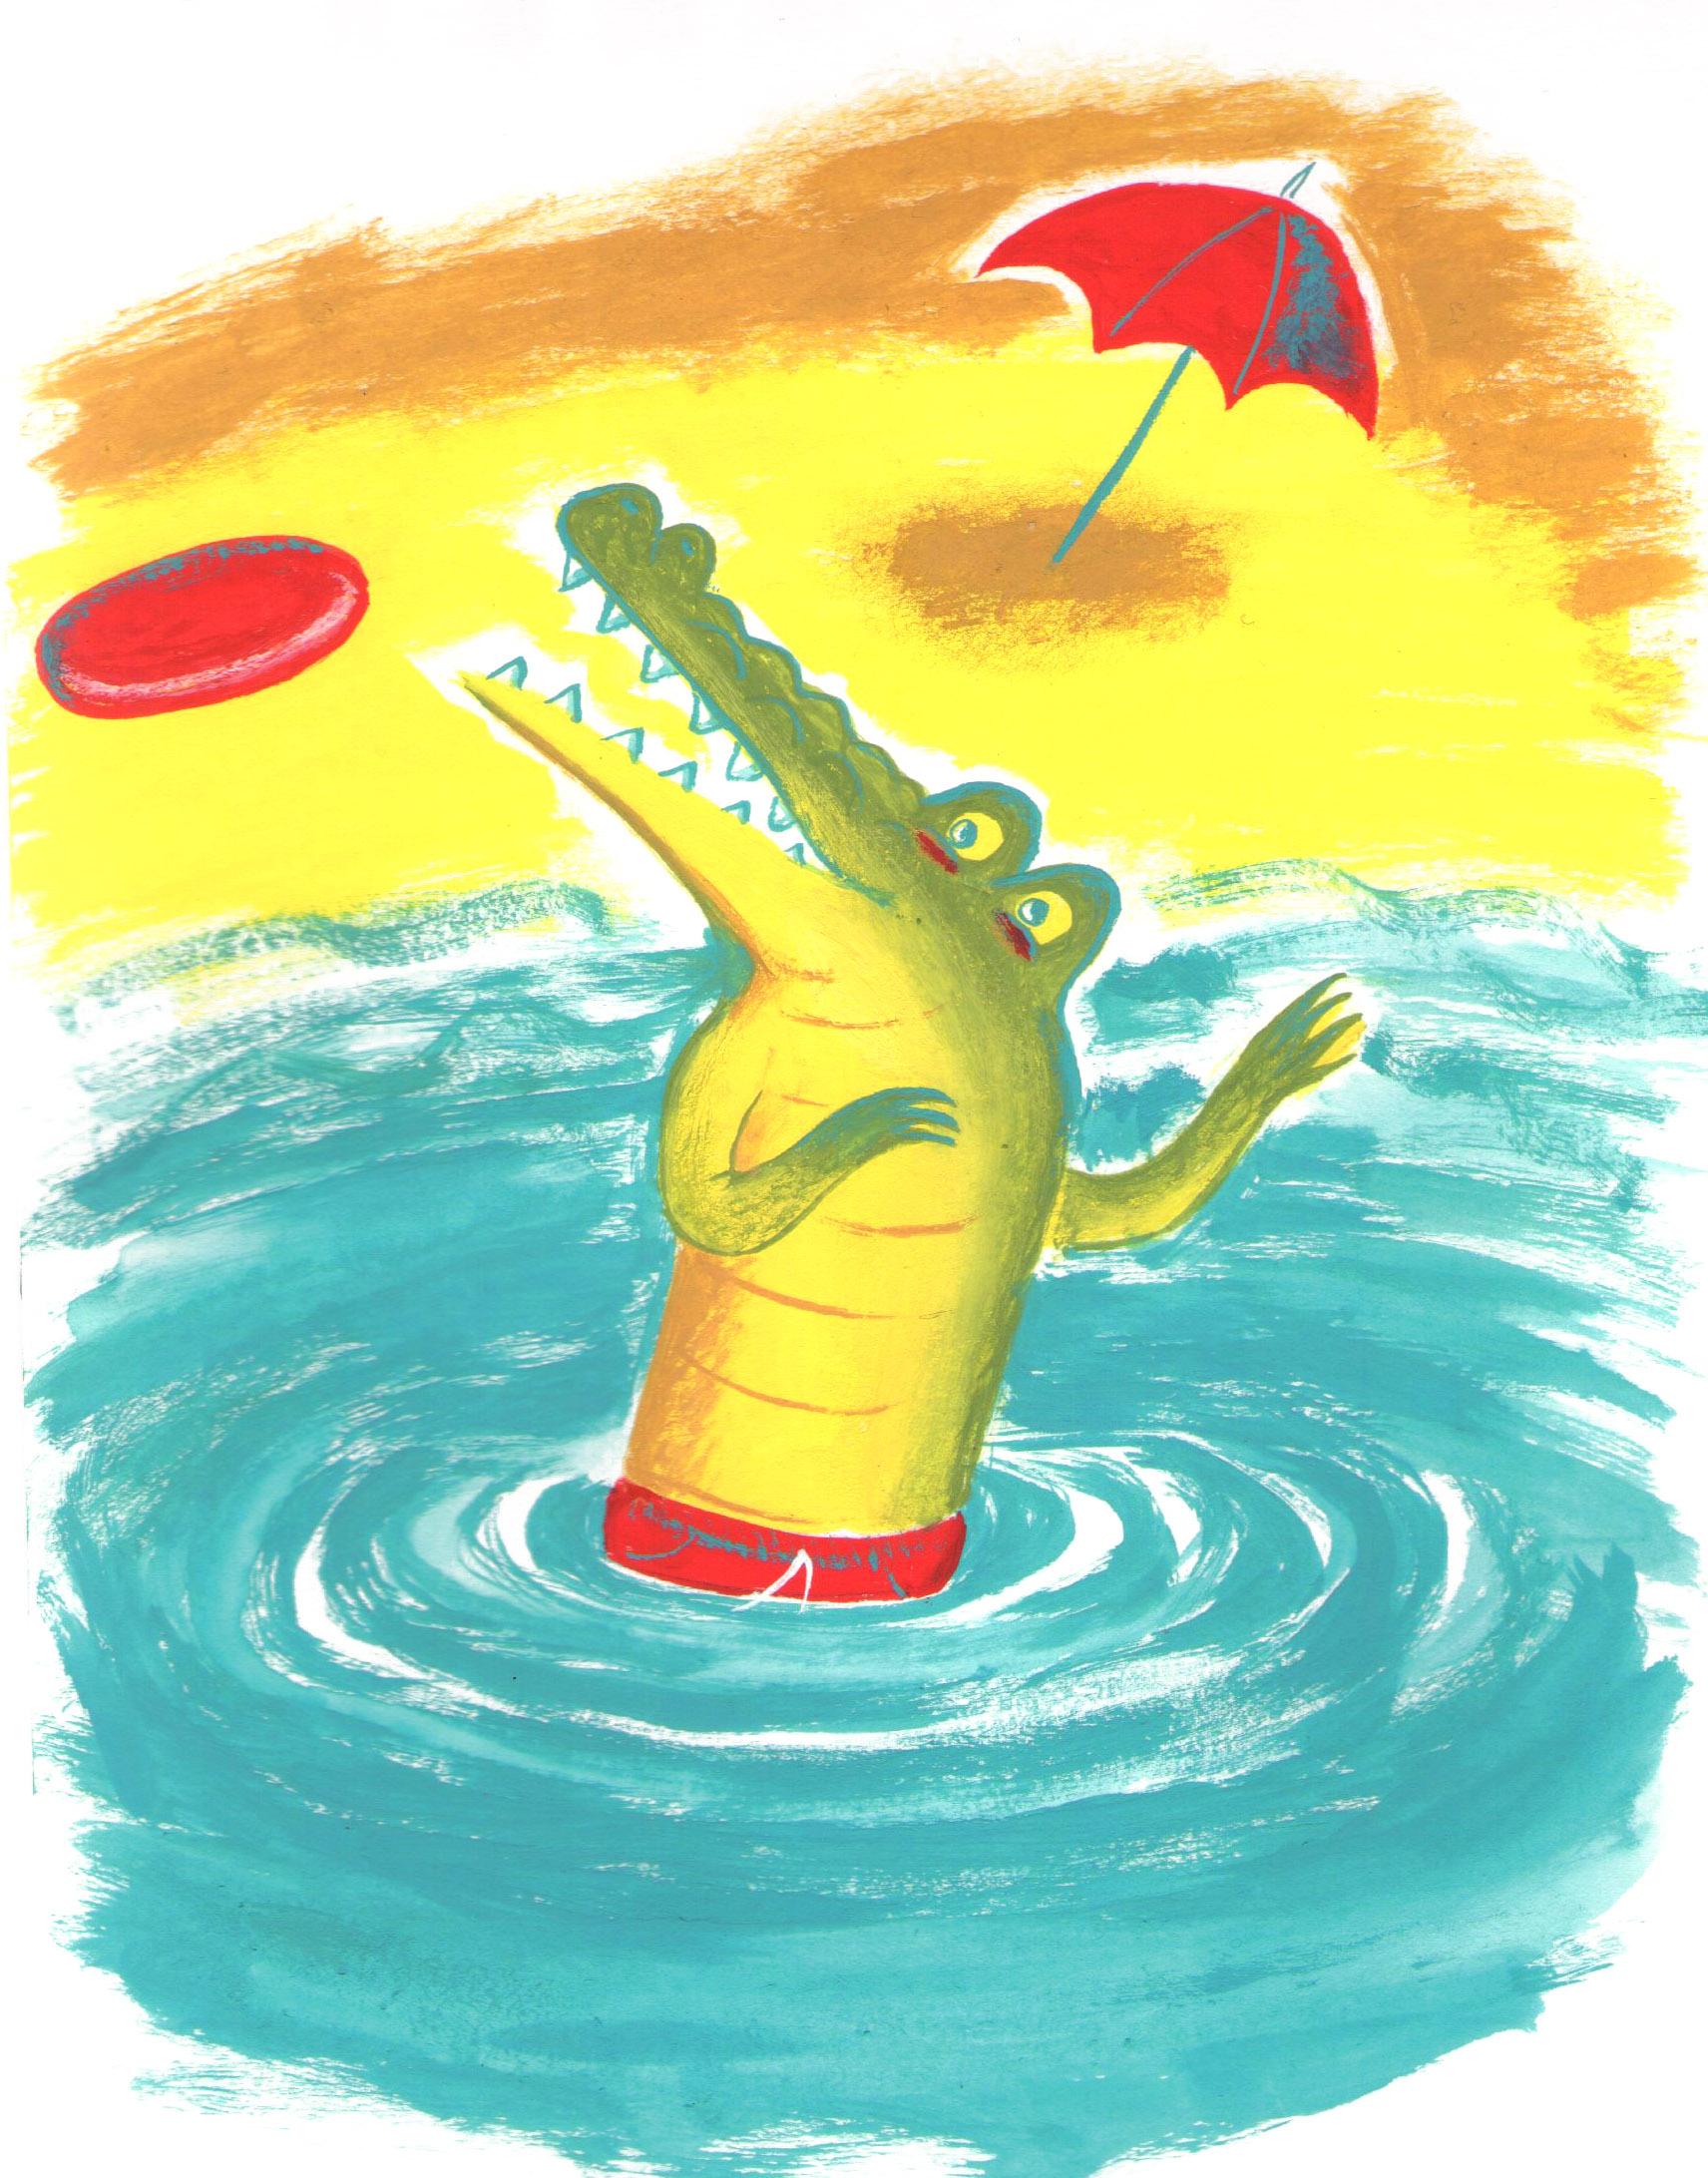 gator-frisbee.jpg